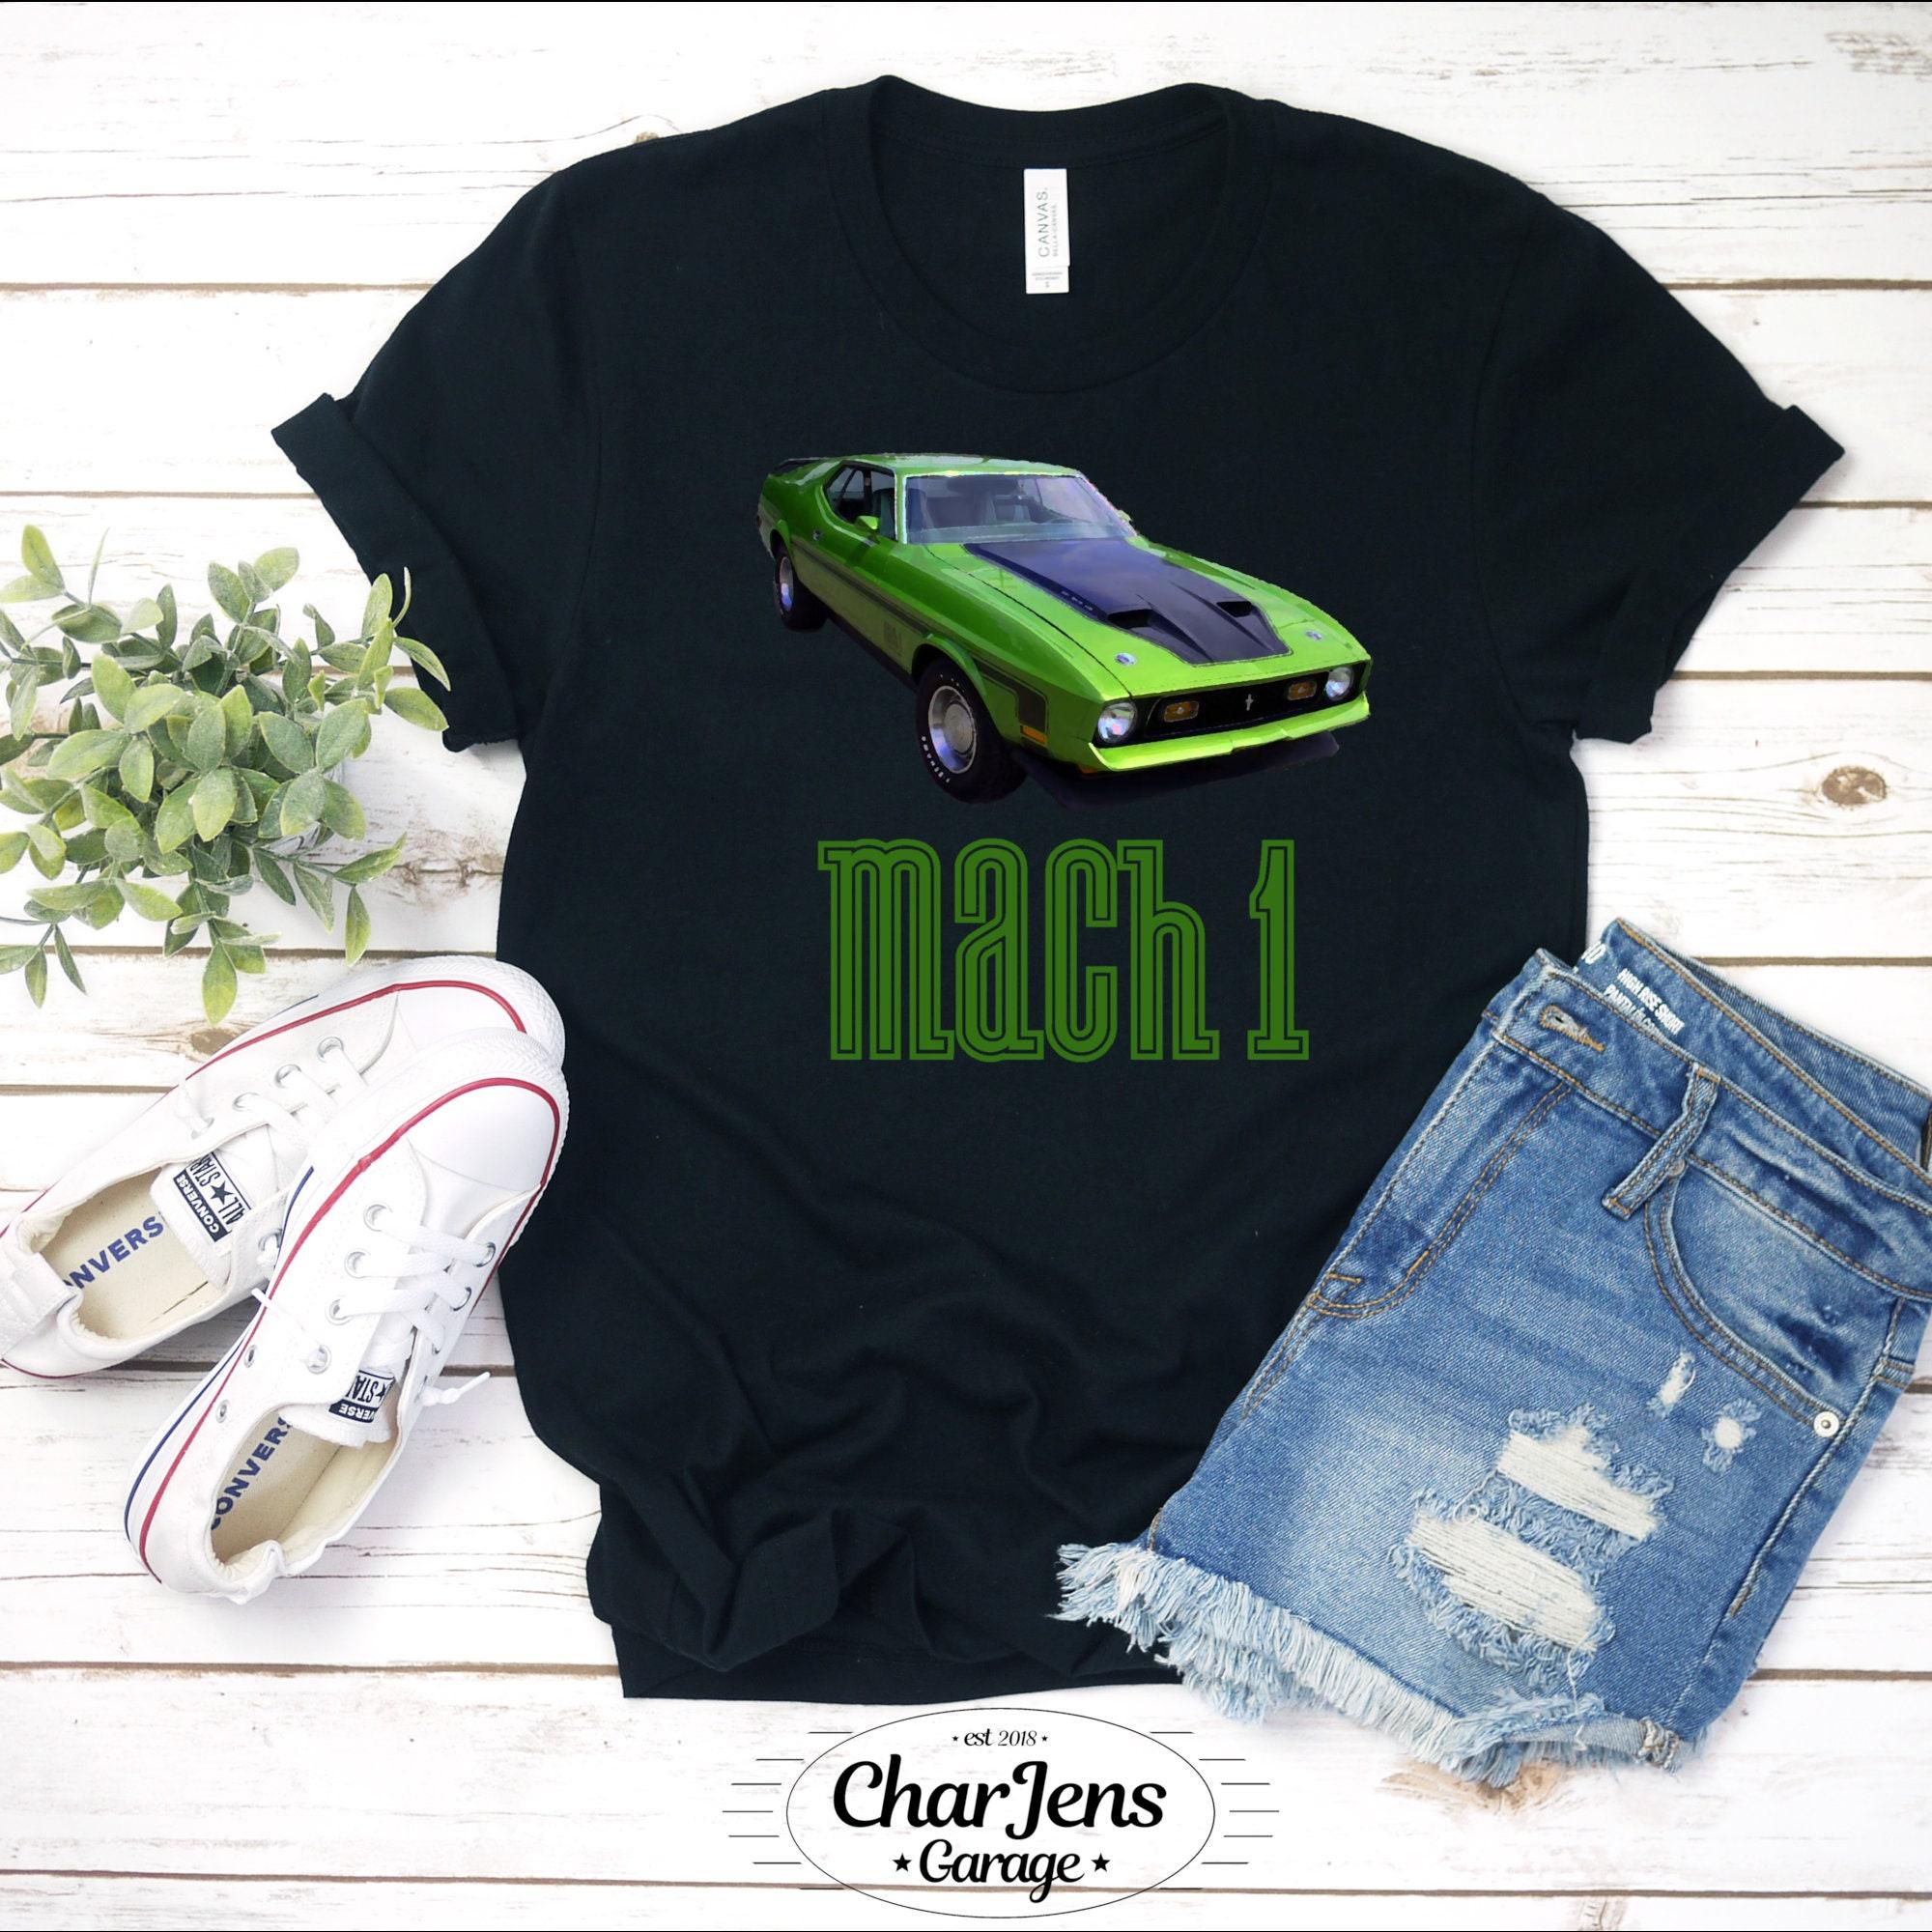 Kids Soft Cotton T Shirt Muscle-Car-SRT8 Stylish Crewneck Short Sleeve Tops Black